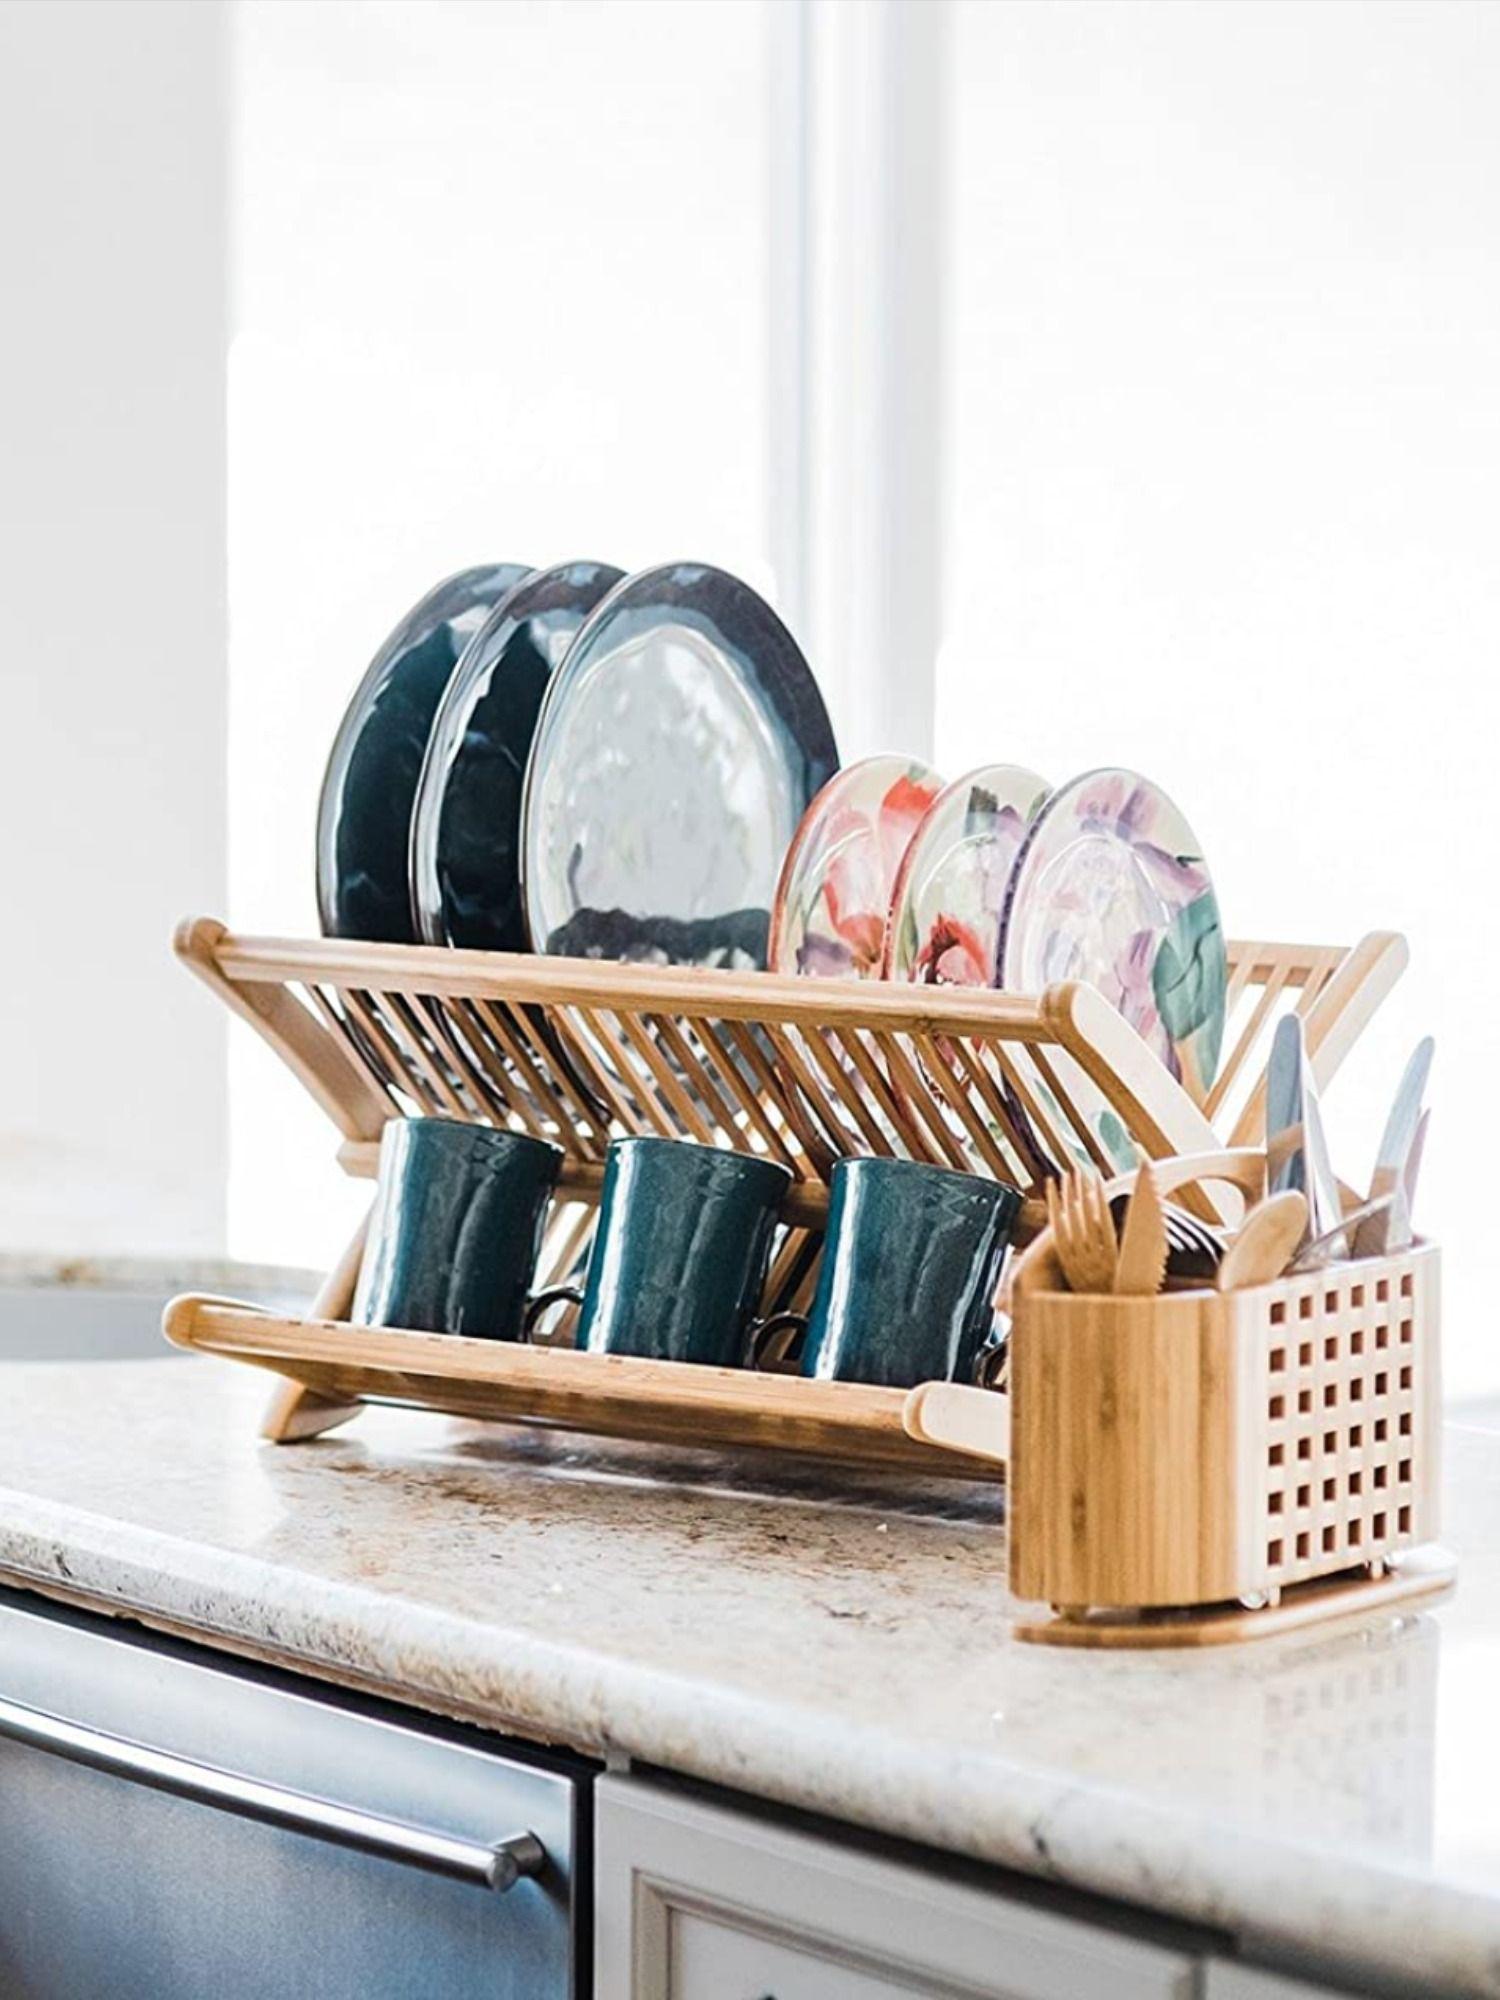 Dish drying rack in 2020 bamboo dishes dish rack drying